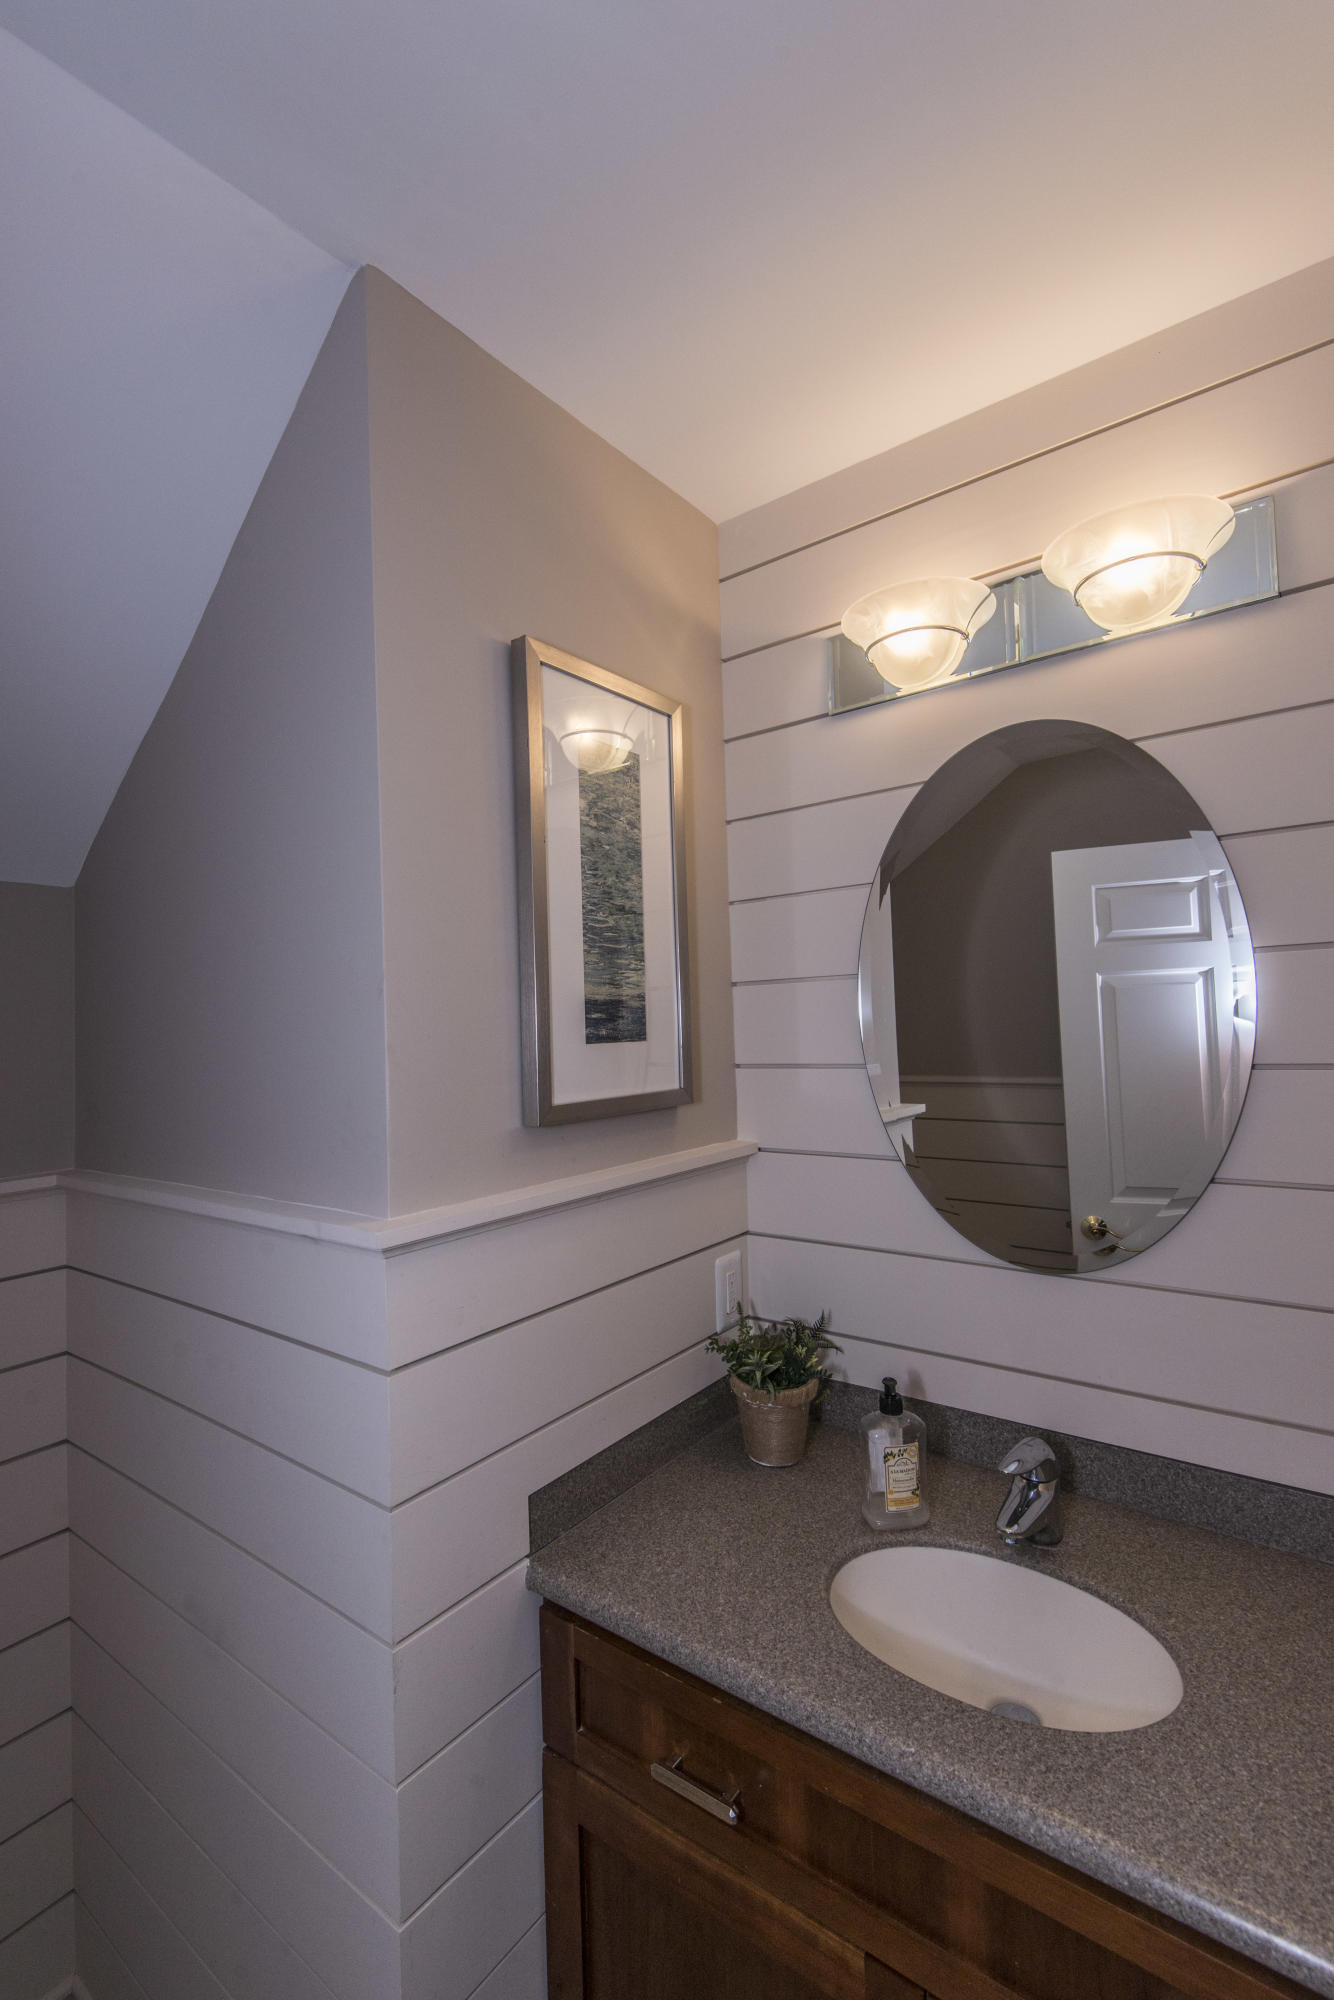 Alston Point Homes For Sale - 683 Faulkner, Mount Pleasant, SC - 14